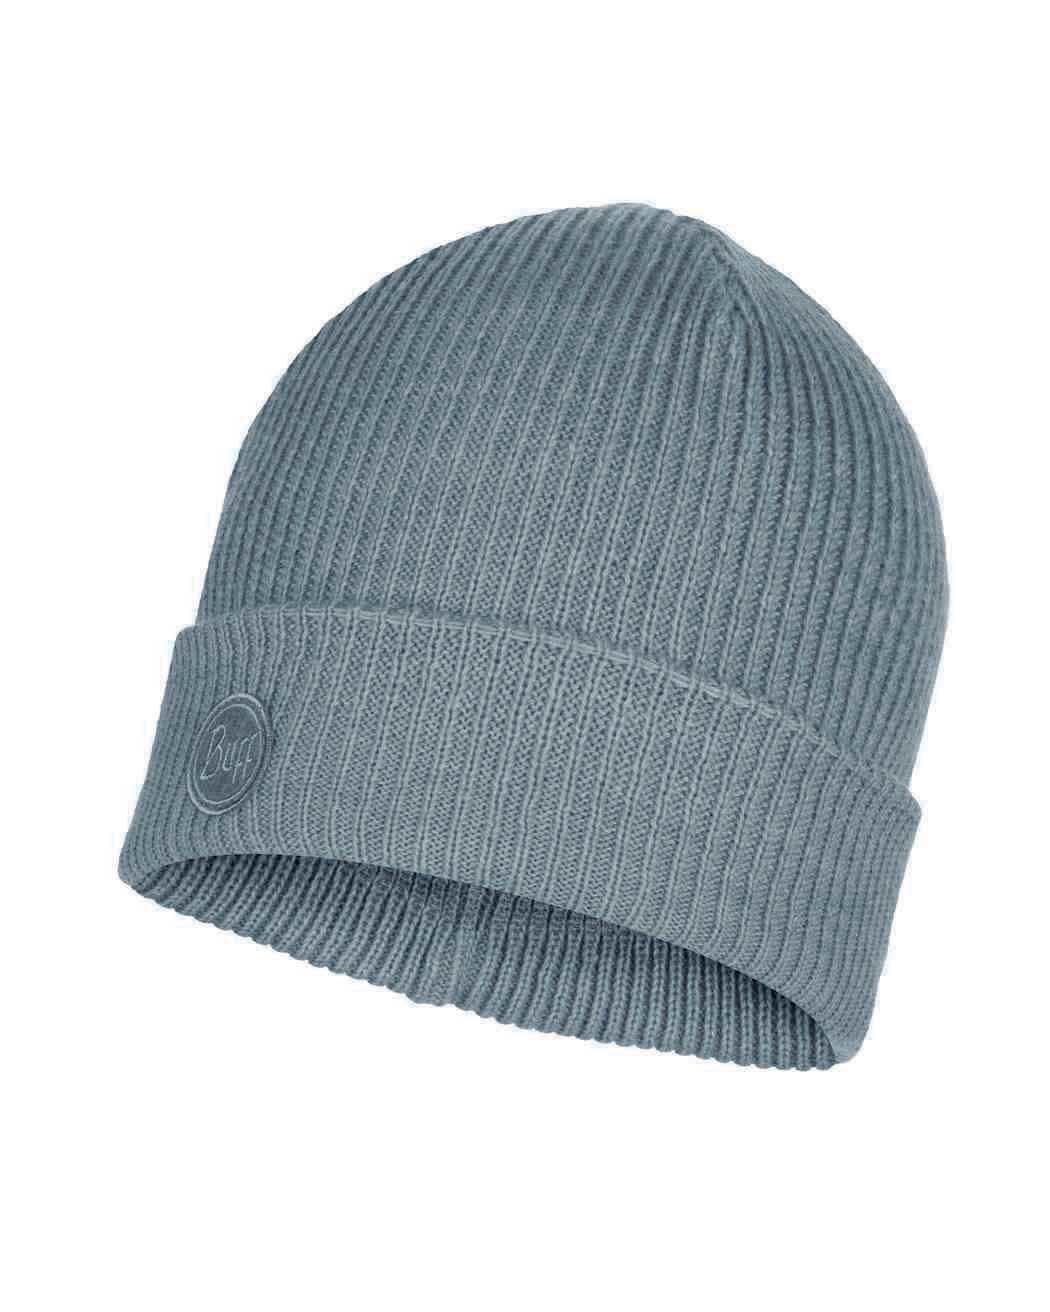 Шапки средней вязки Вязаная шапка Buff Hat Knitted Edsel Melange Grey 116027.938.10.00.jpg